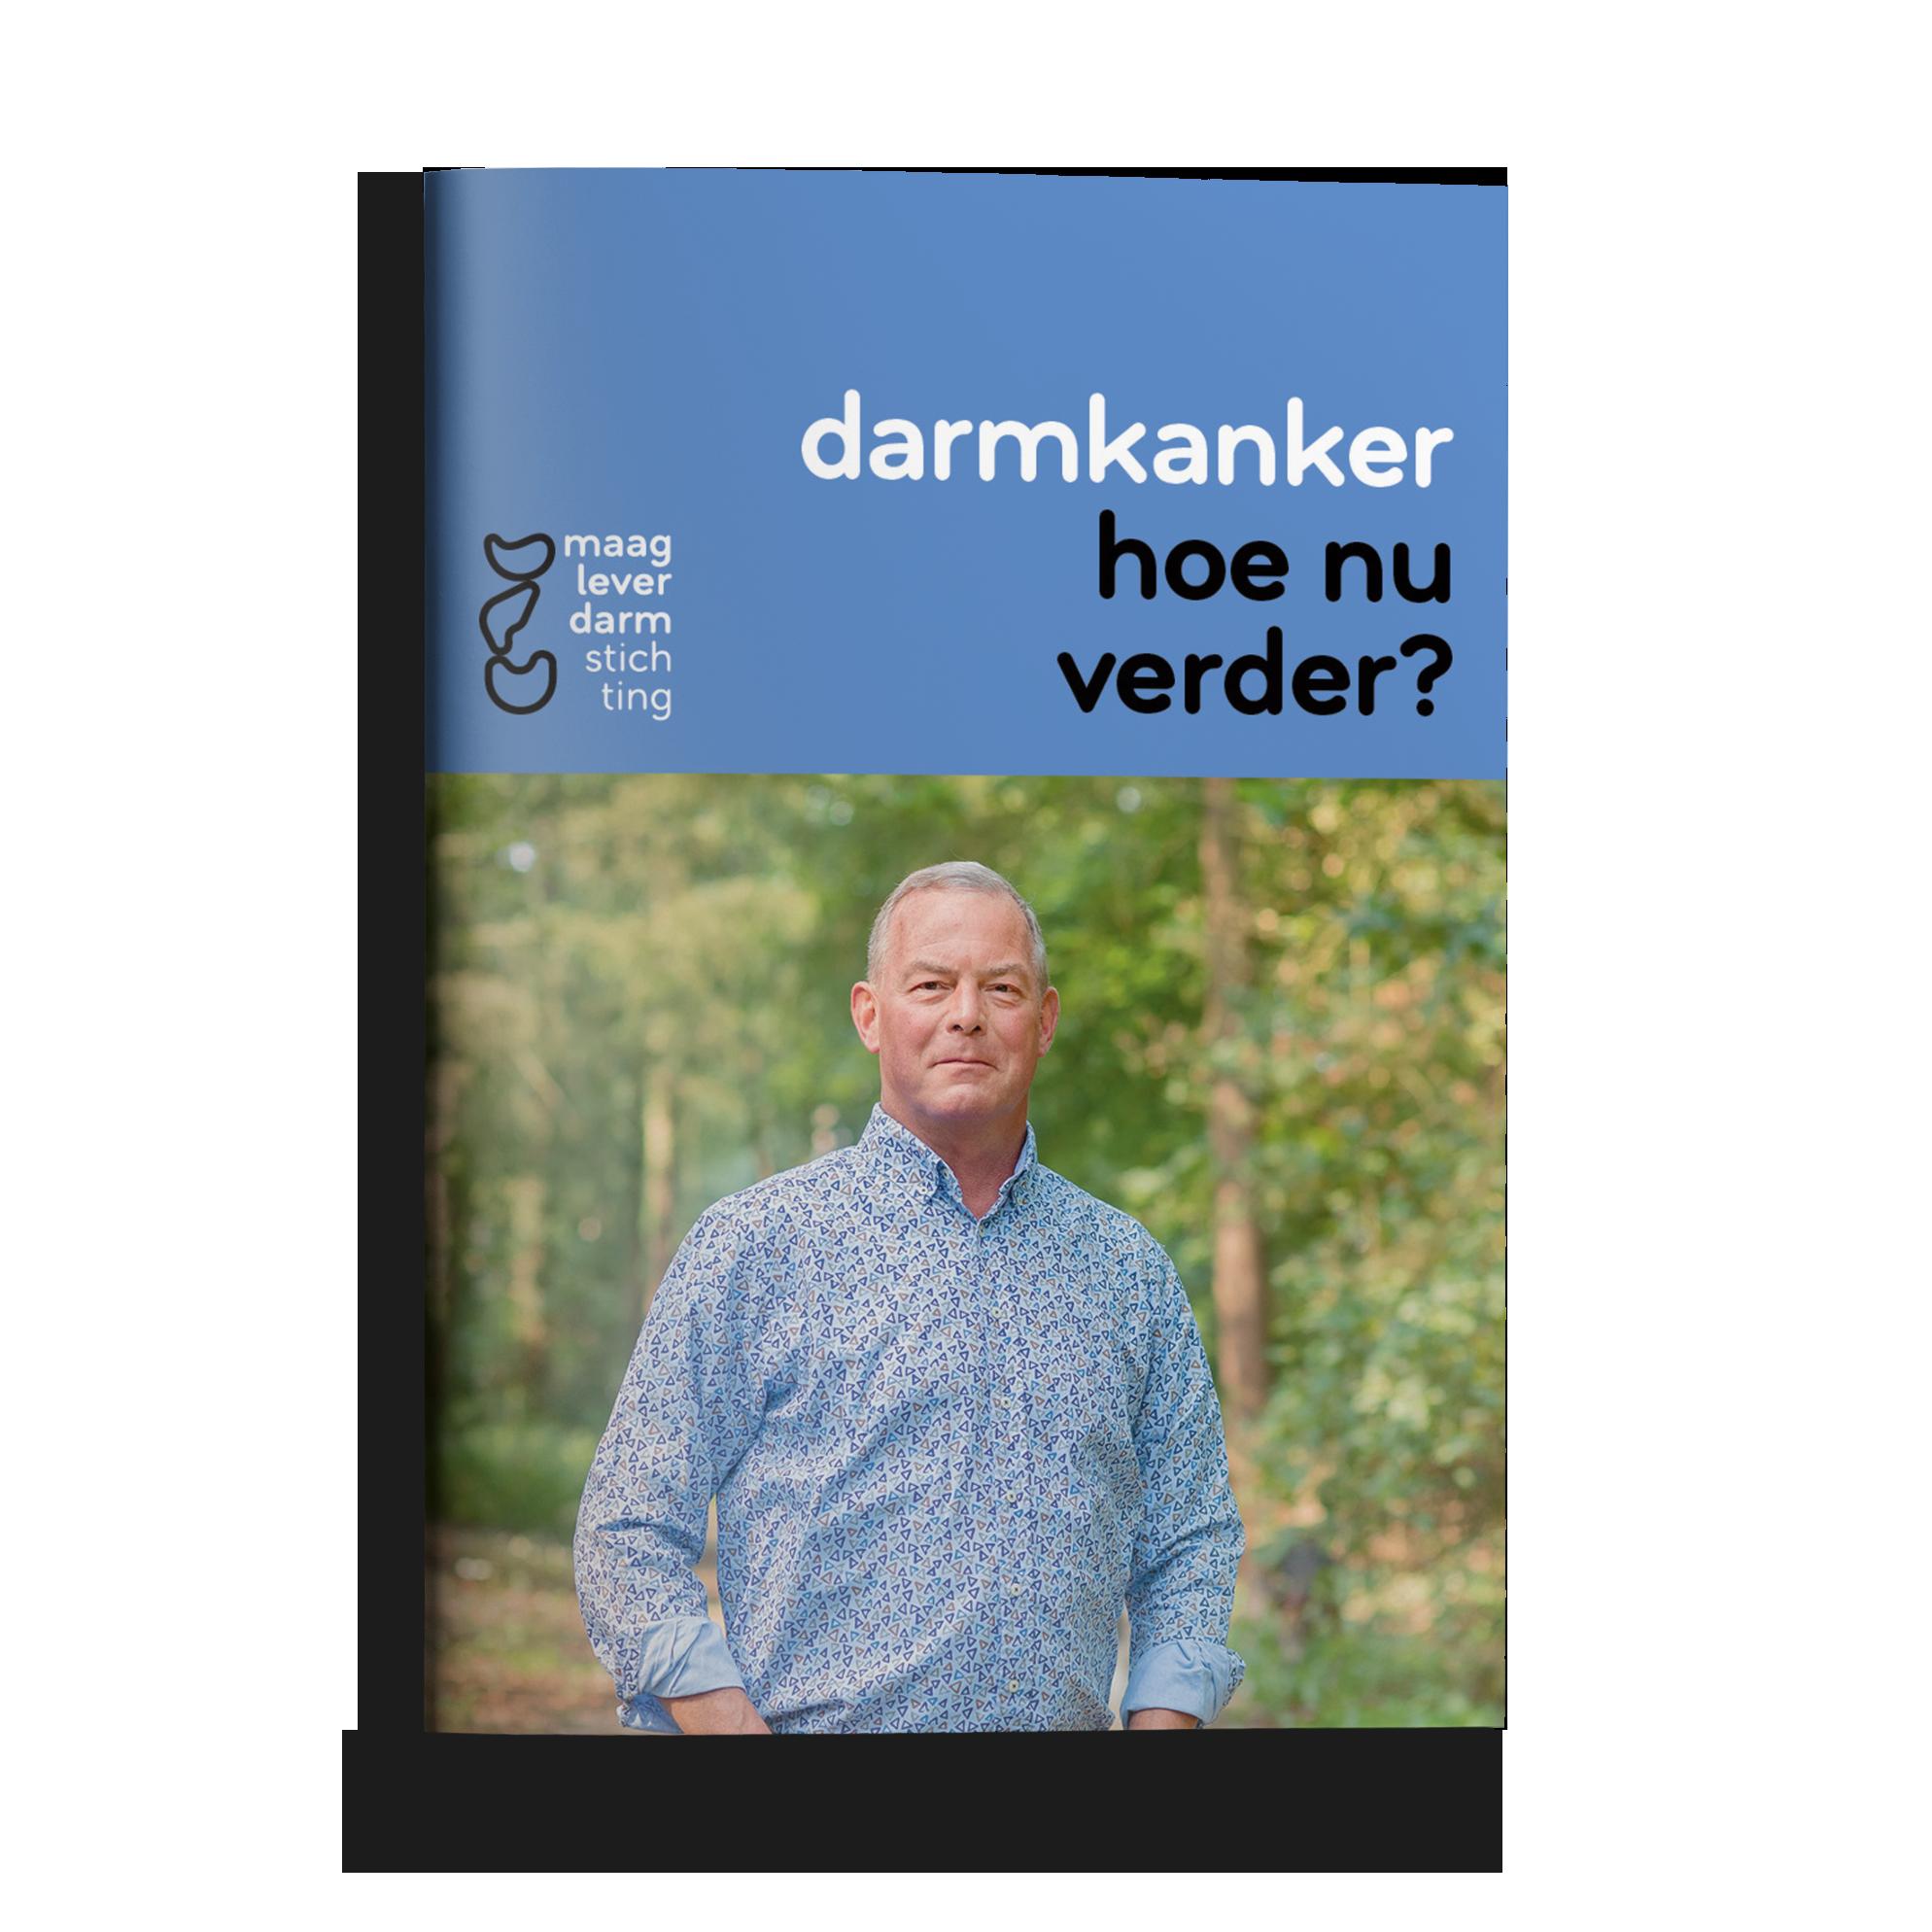 https://www.mlds.nl/content/uploads/MLDS-Mockup-Darmkanker.png